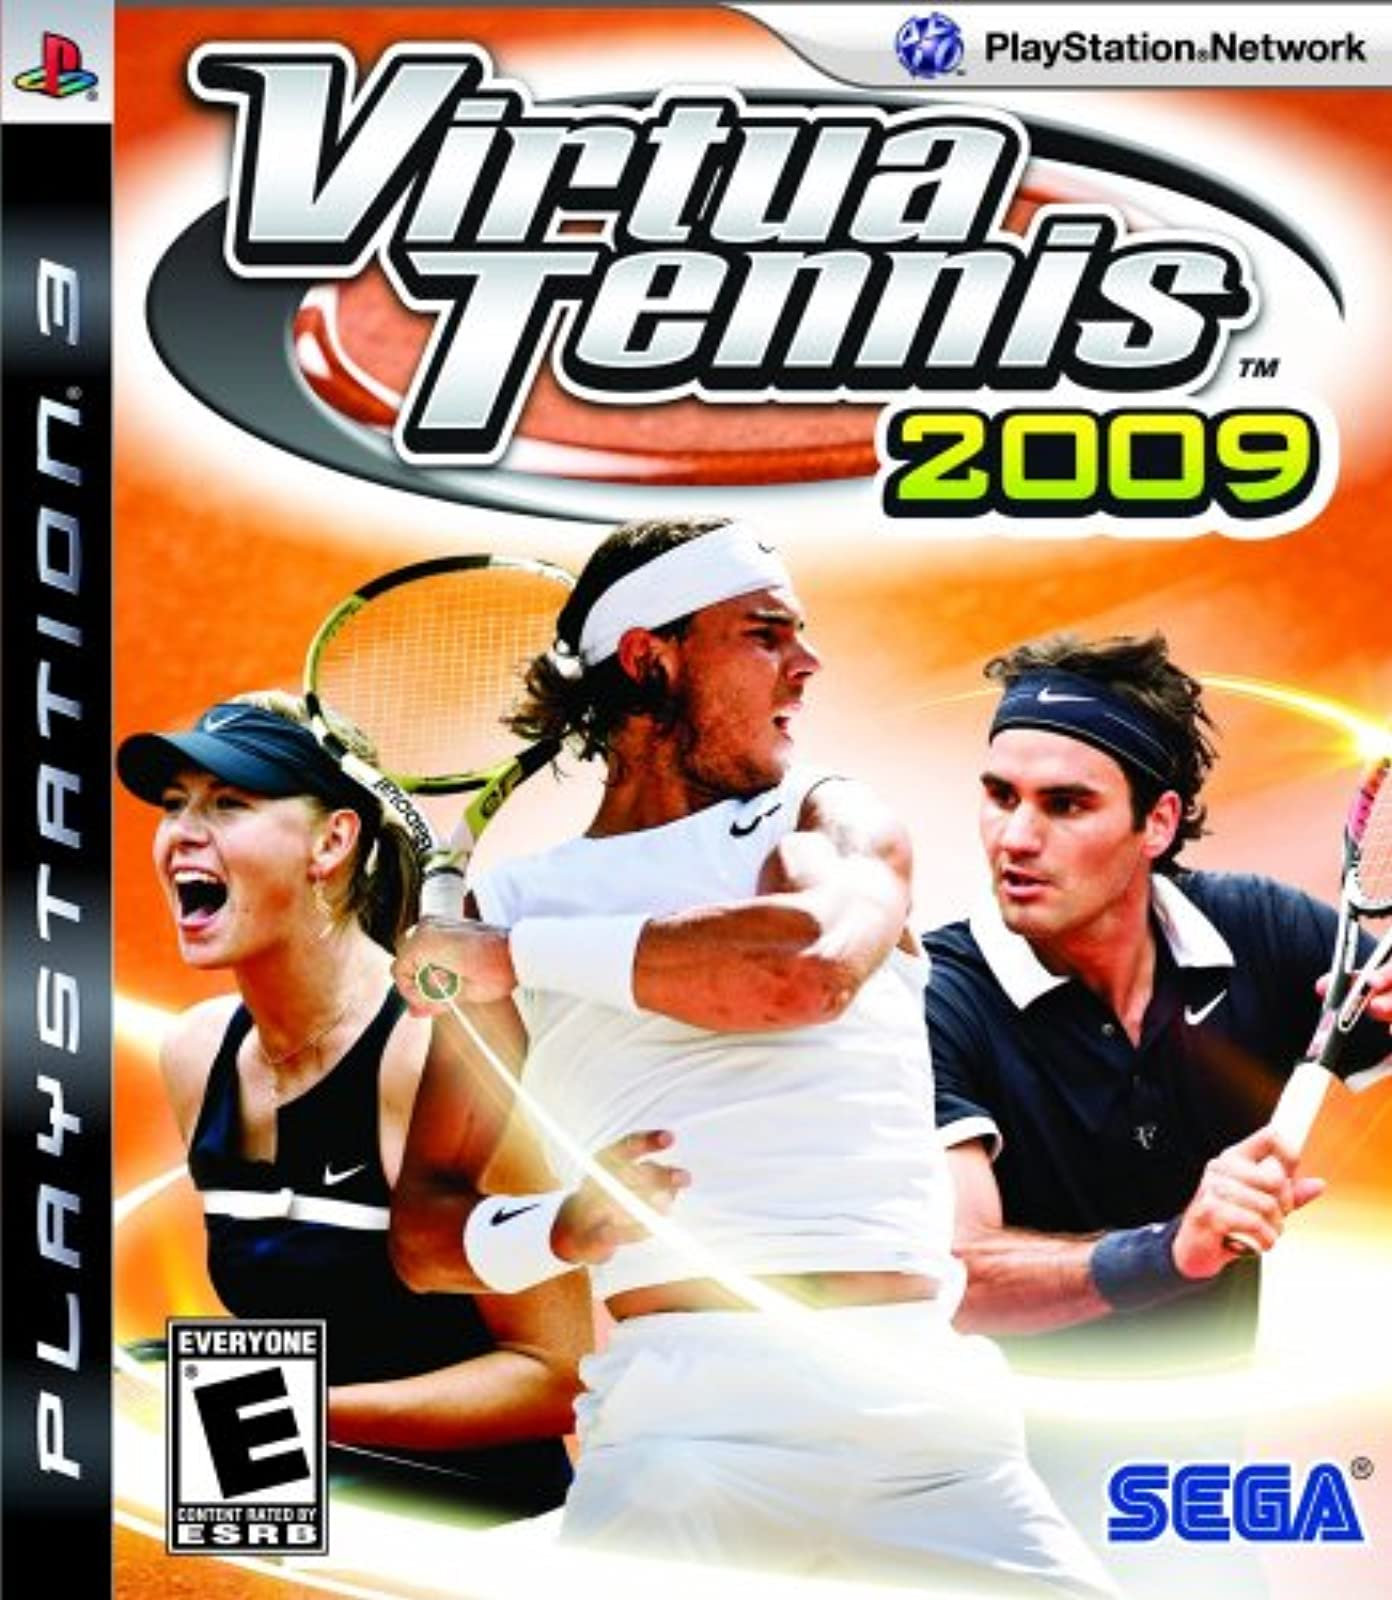 Virtua Tennis 2009 For PlayStation 3